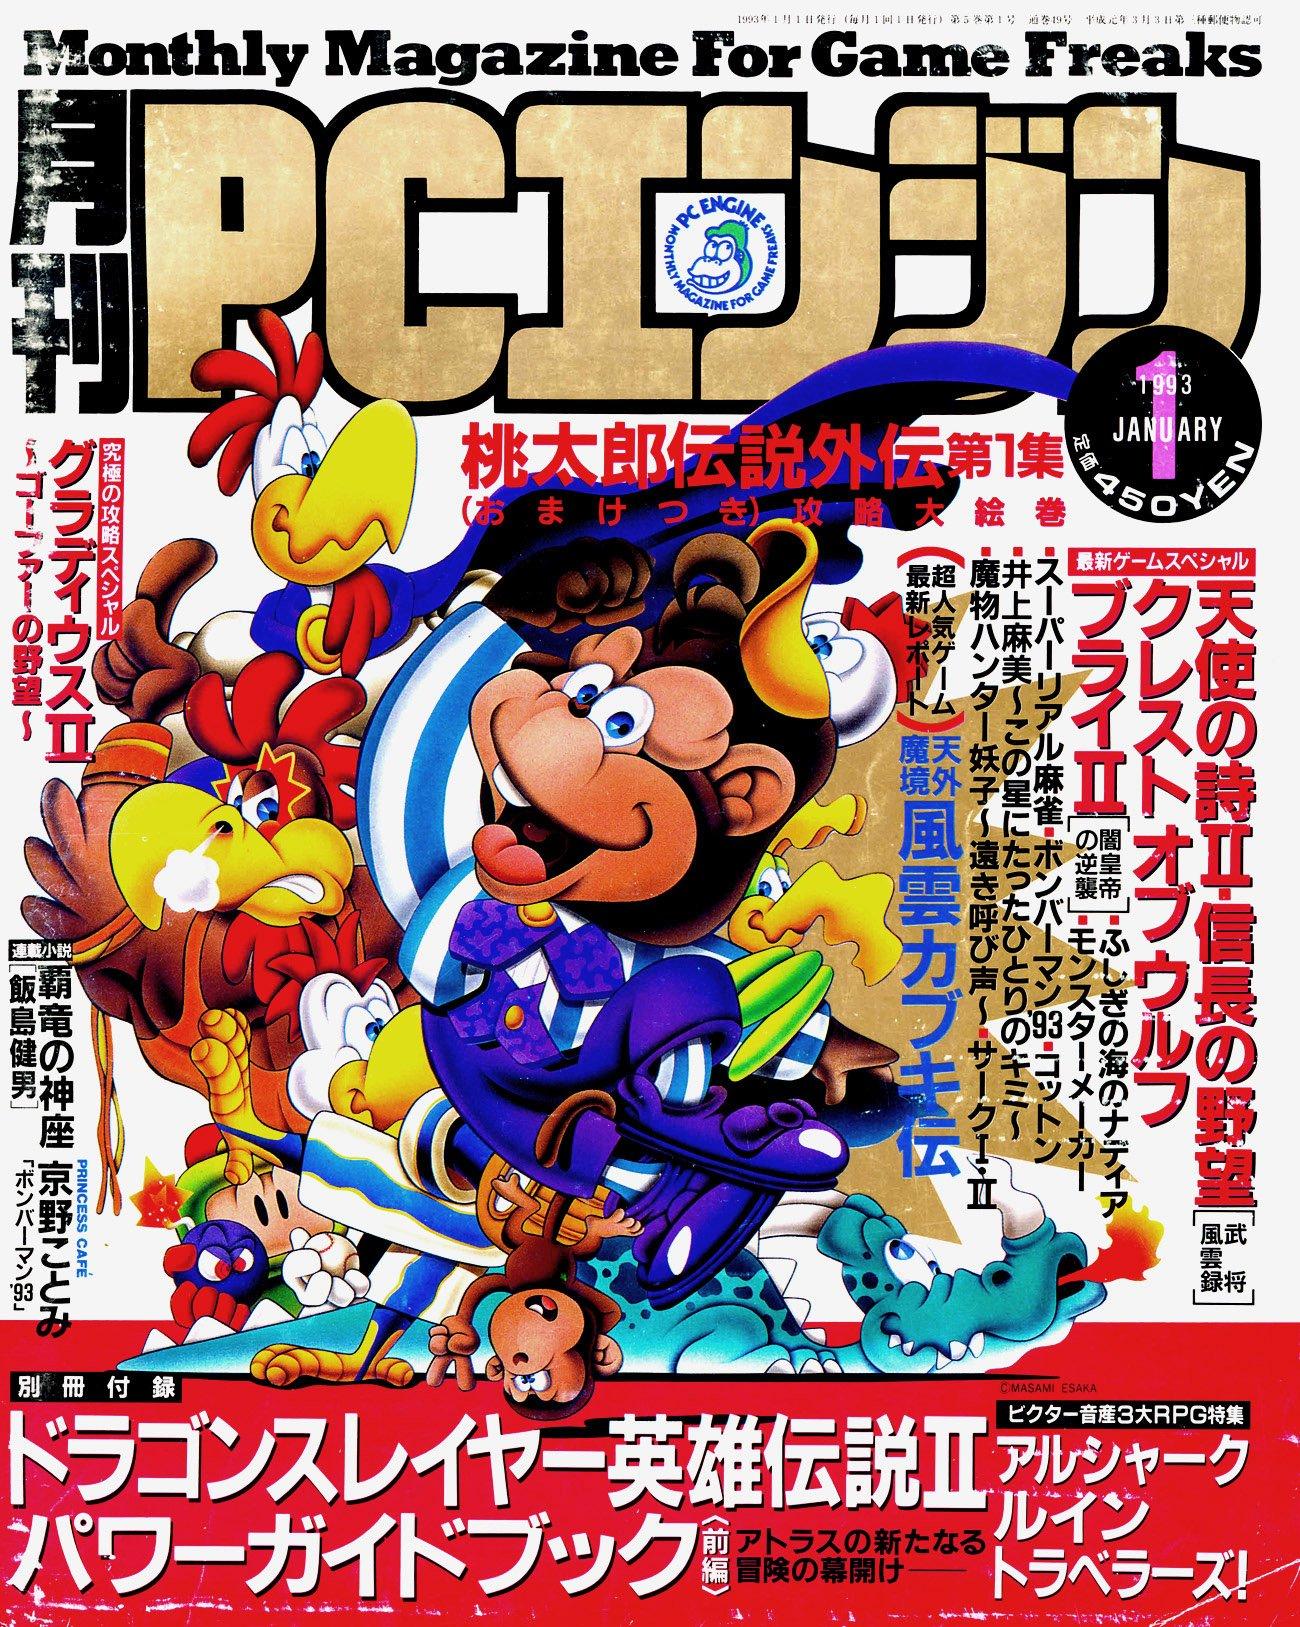 Gekkan PC Engine Issue 49 (January 1993)